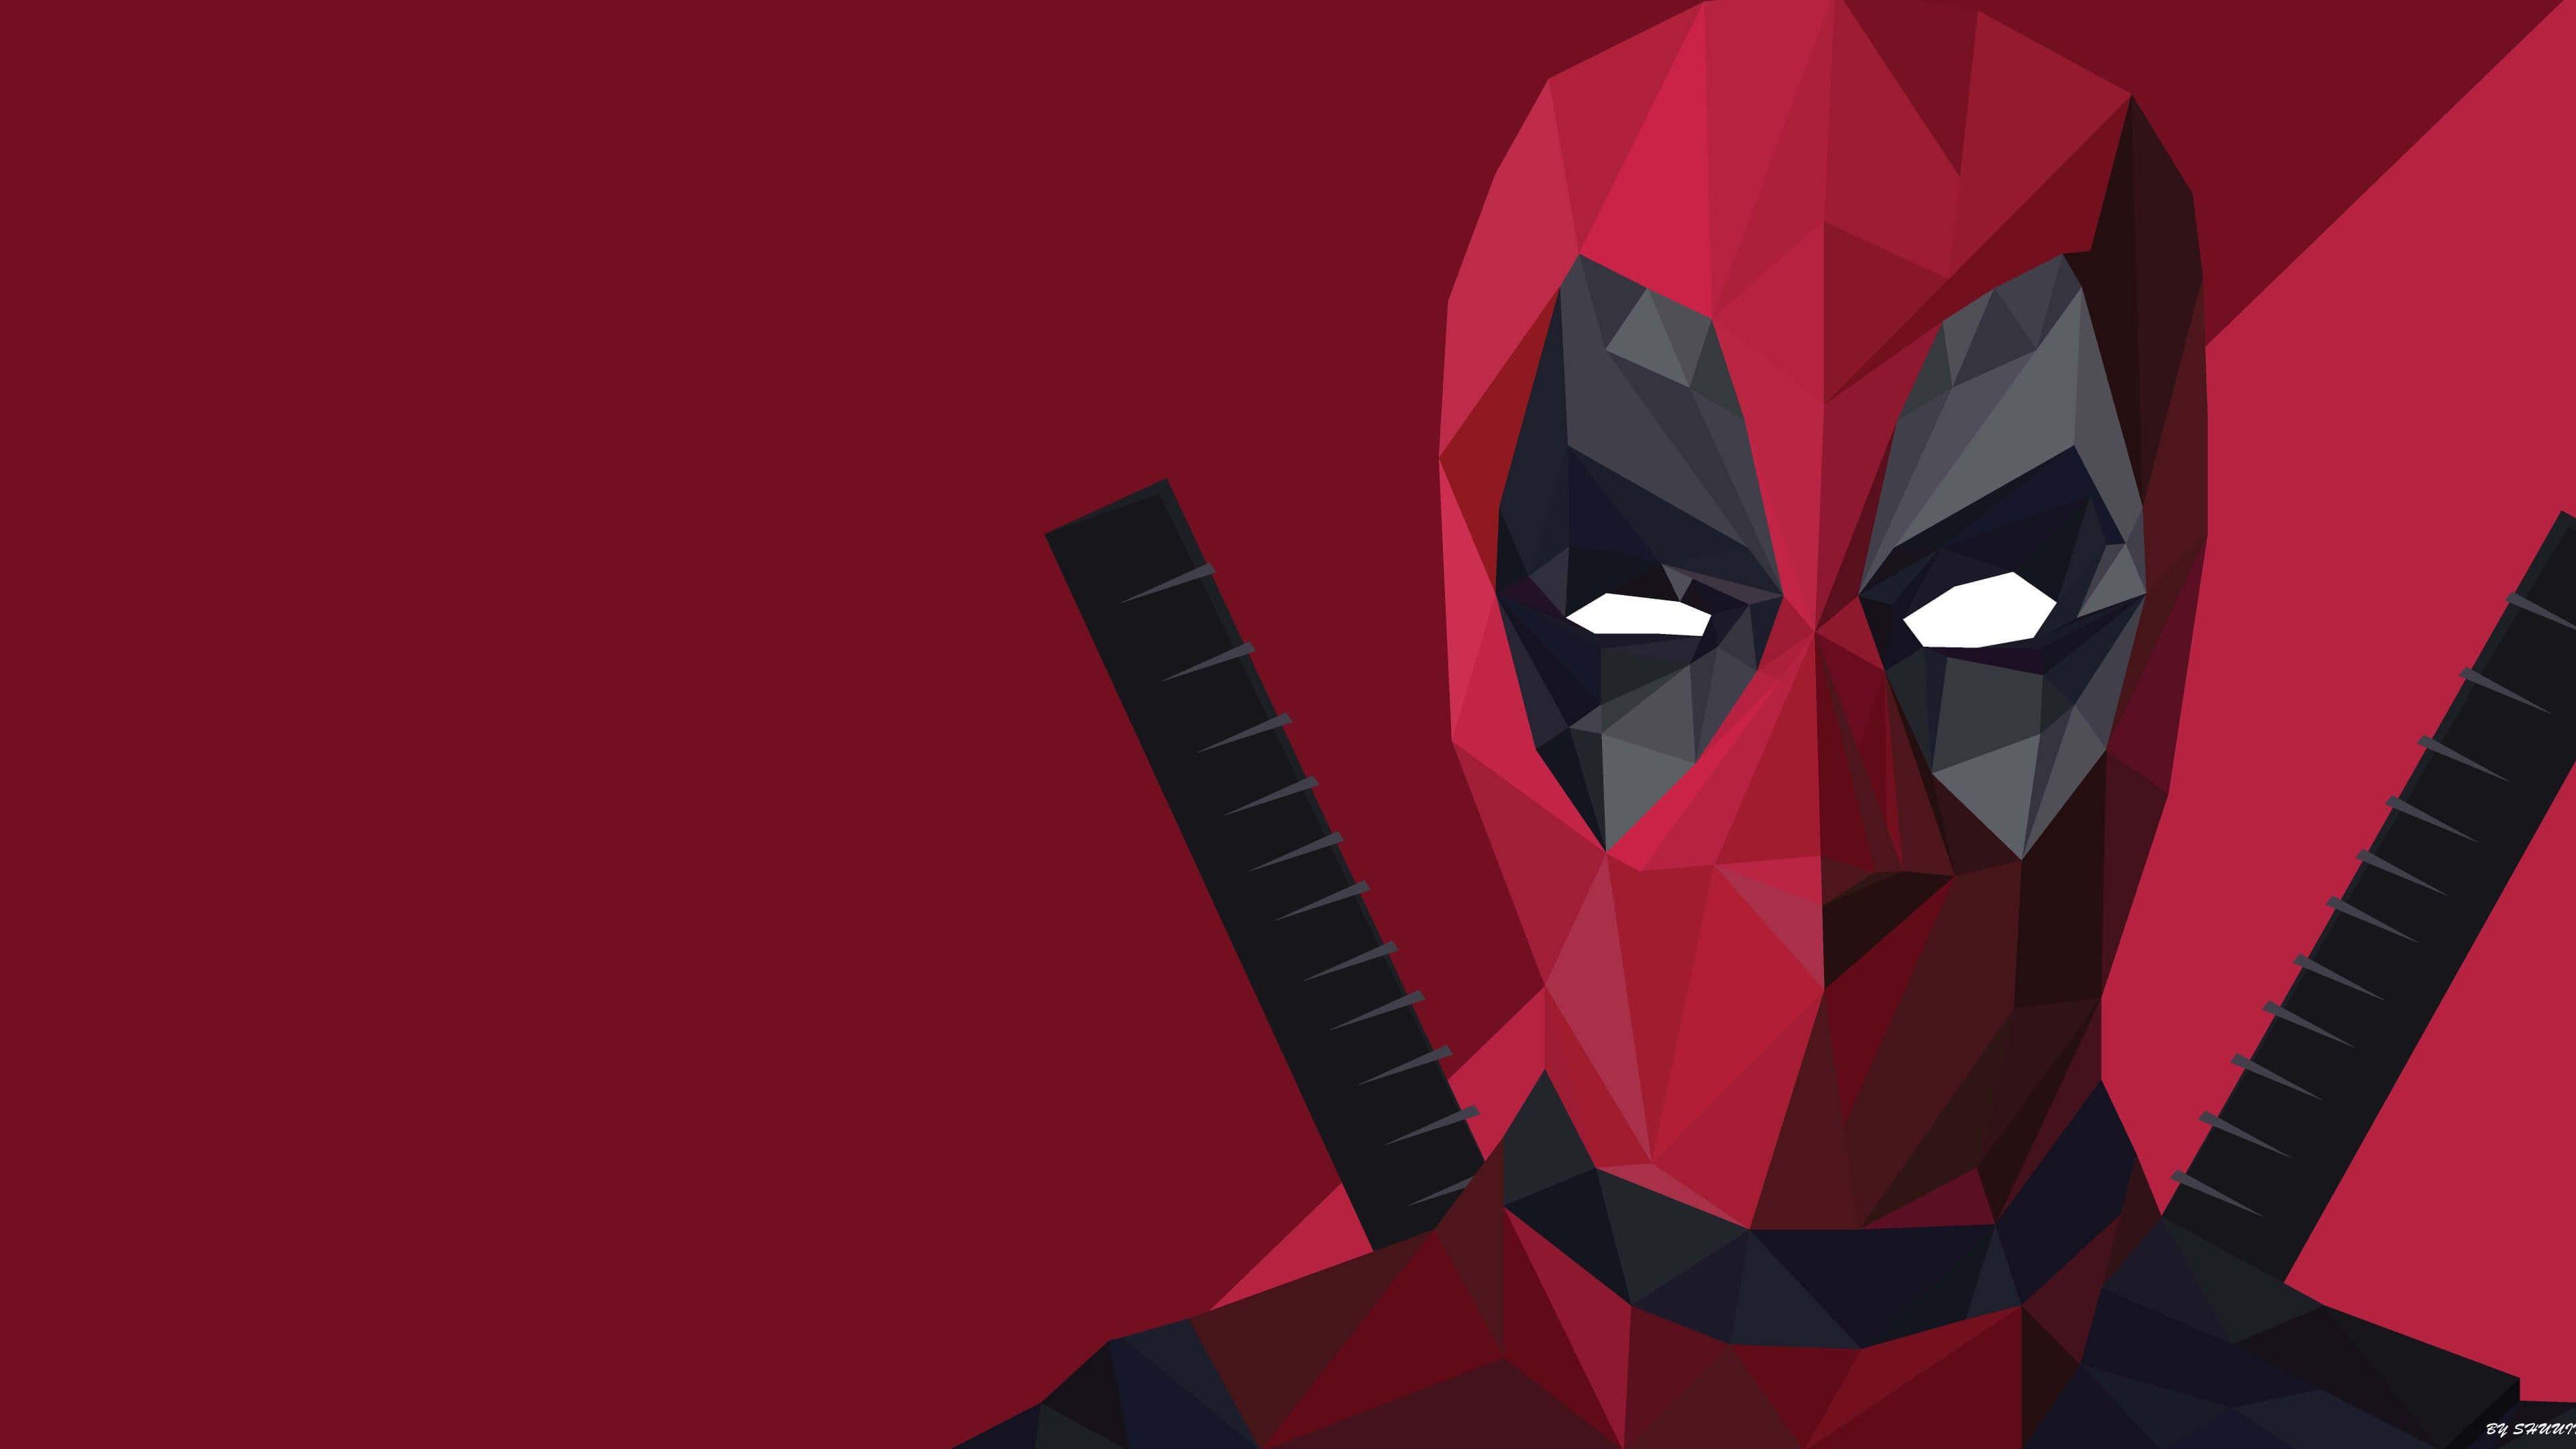 Marvel And Dc Comics Images Memes Wallpaper And More Deadpool Wallpaper Desktop Deadpool Wallpaper Deadpool Hd Wallpaper